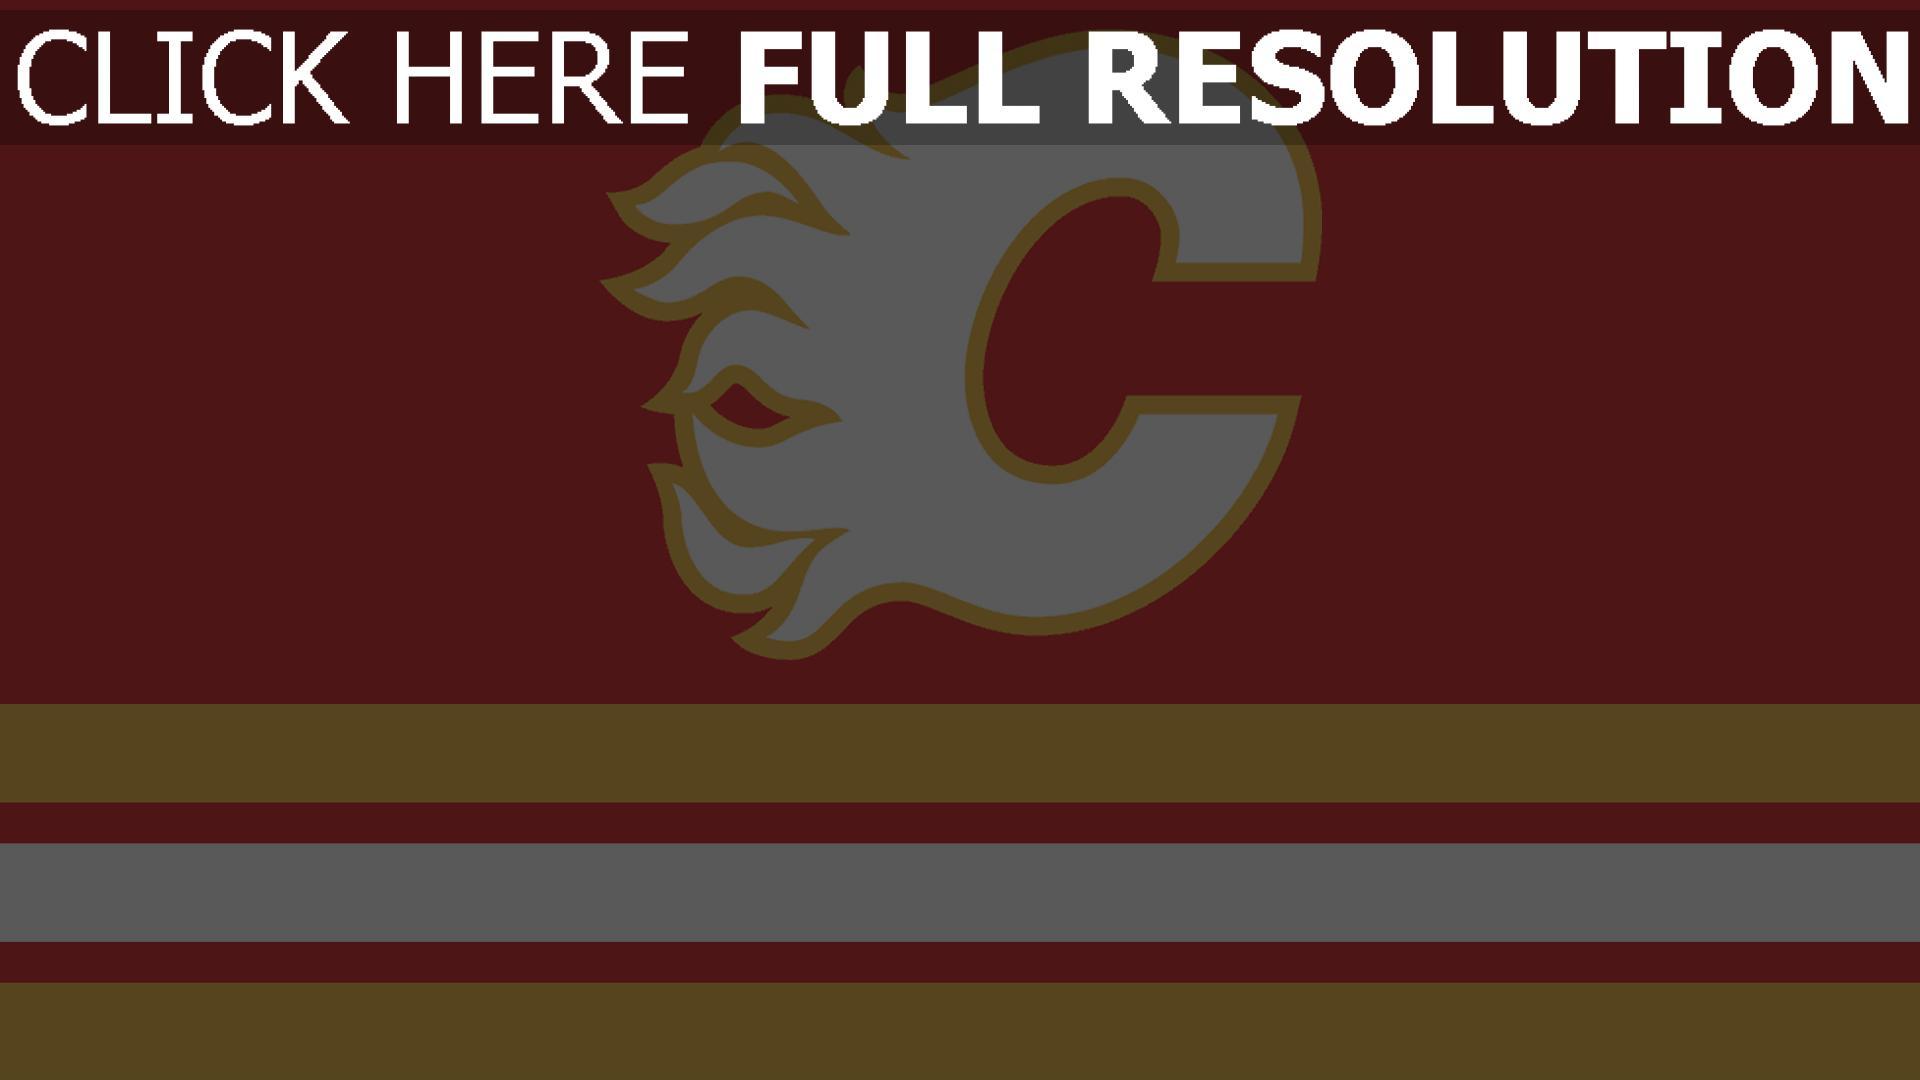 hd hintergrundbilder kanada calgary flames hockey logo 1920x1080